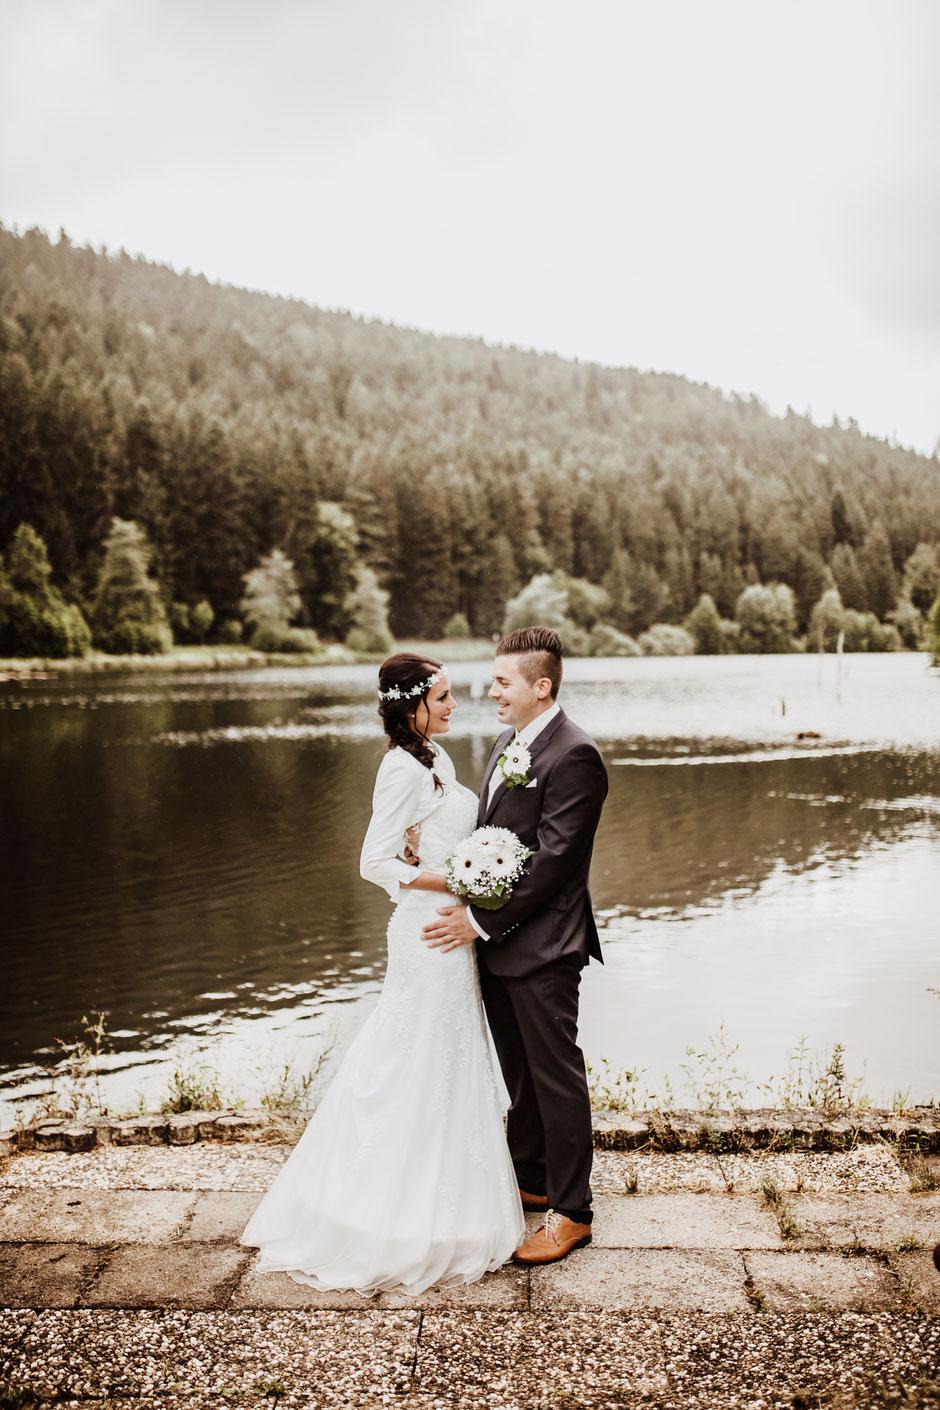 hochzeitsfotografie_belinda_bäuerle_brautpaar_shooting_wedding